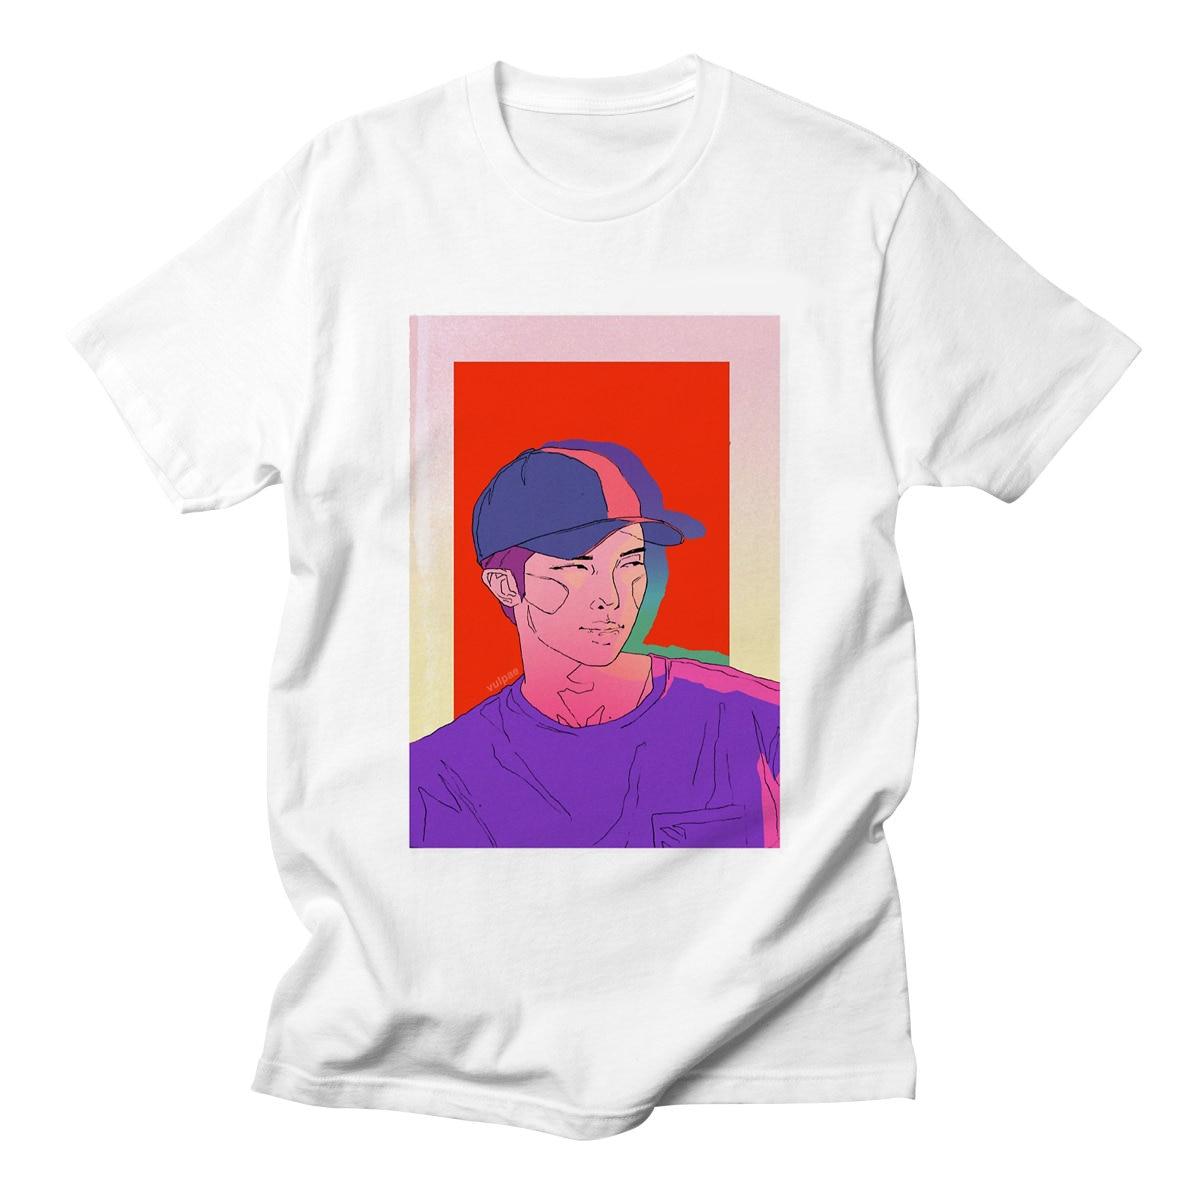 LettBao 2018 Harajuku Fashion Bts Kpop Tshirt Women Cotton T Shirt Elegant Korean Style shirt camiseta mujer